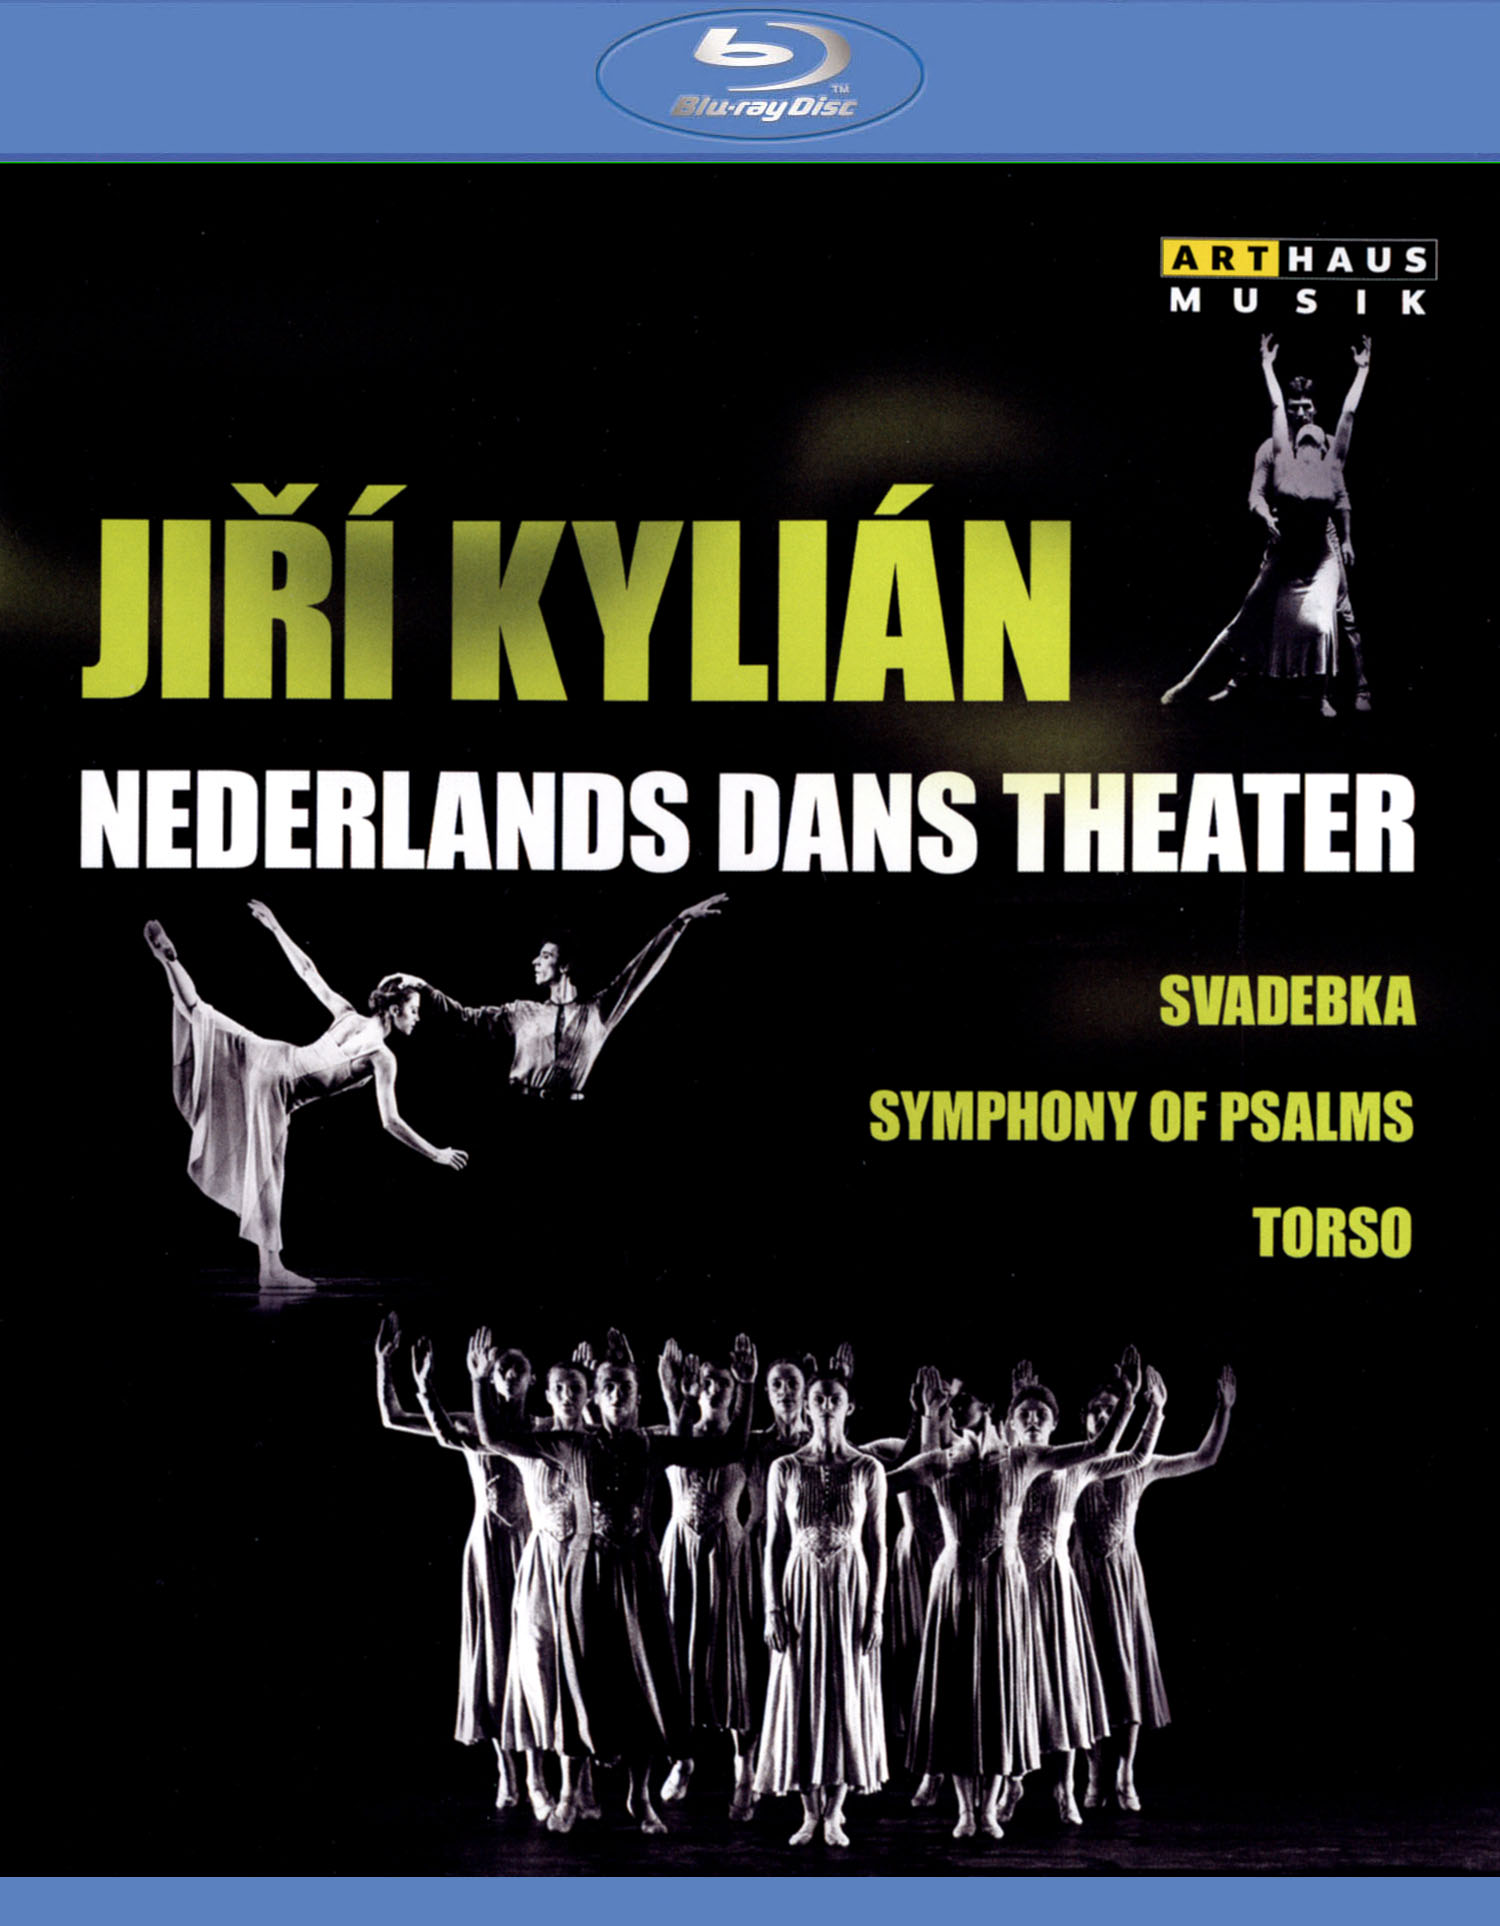 Jiri Kylian/Nederlands Dans Theater: Svadebka/Symphony of Psalms/Torso